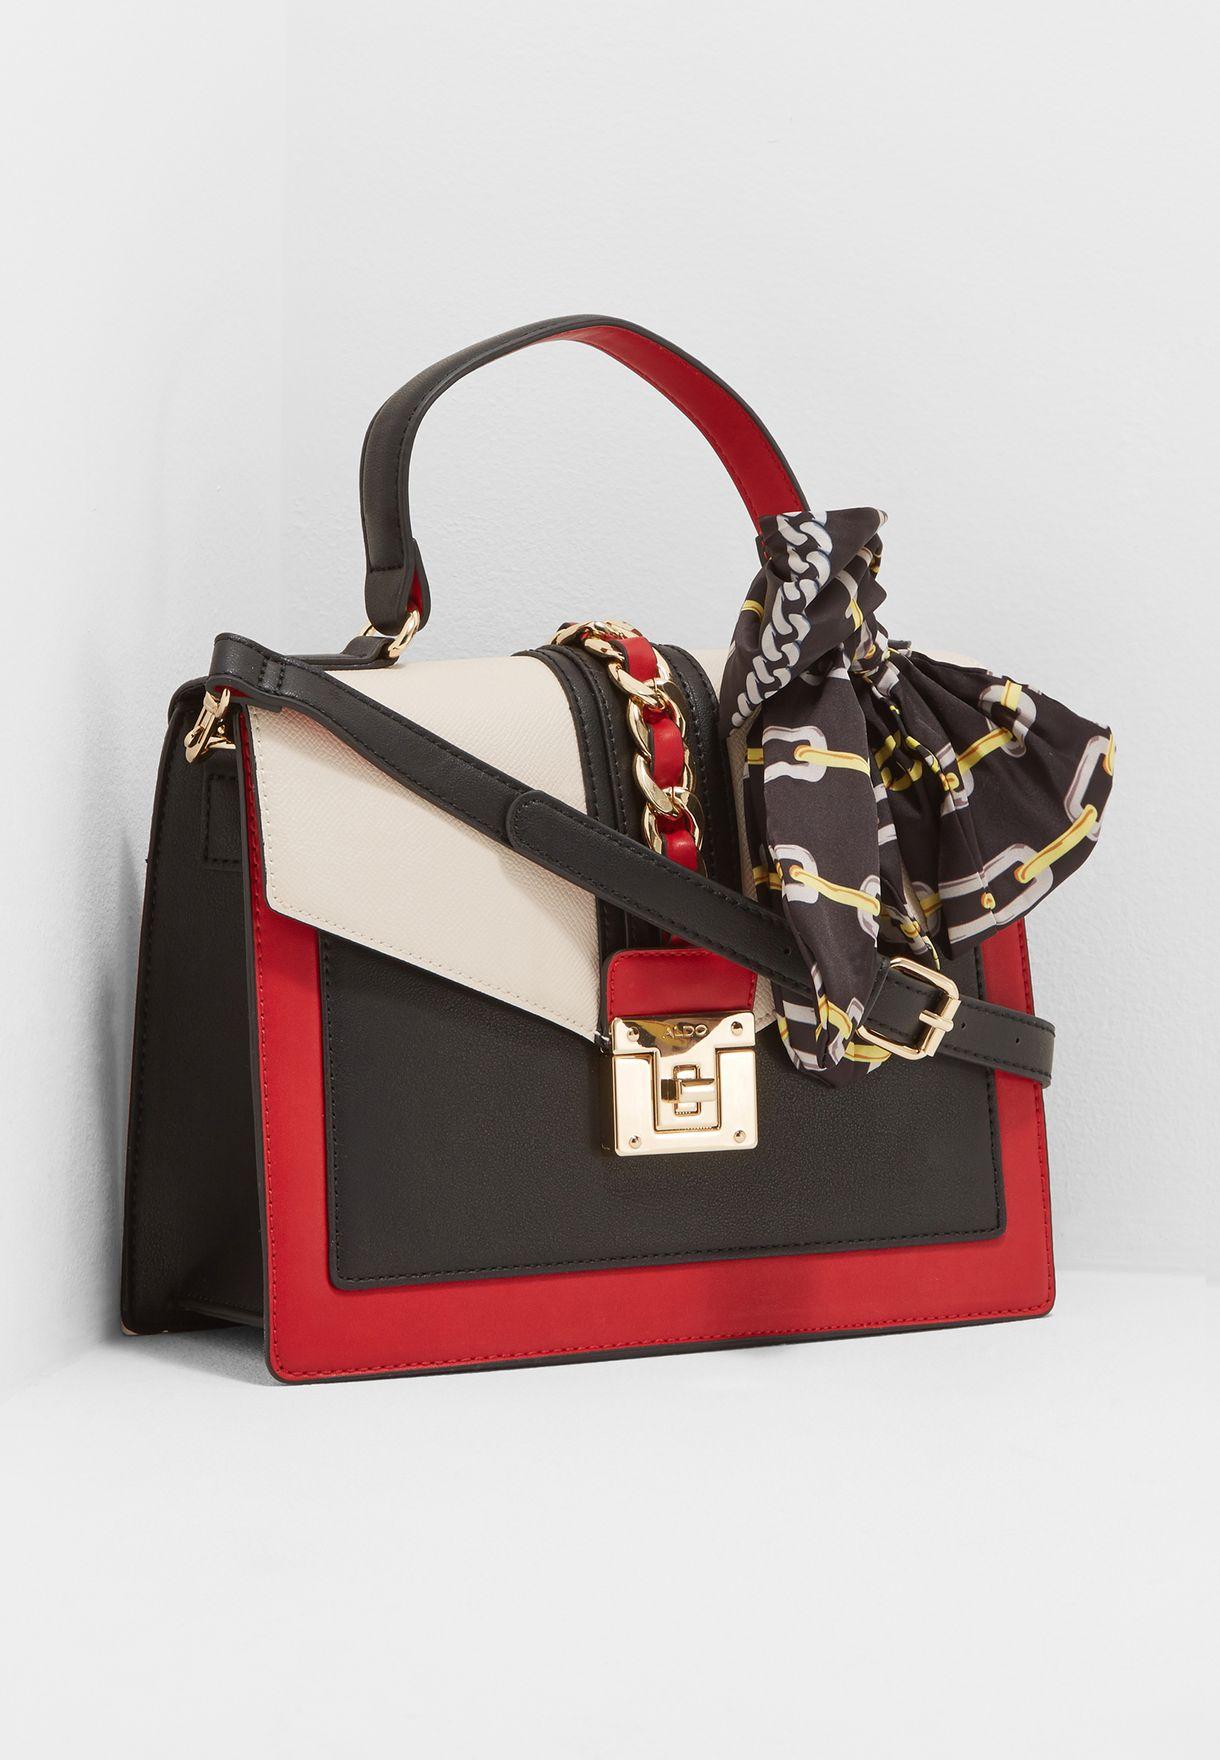 cd1fc2e56a4 Shop Aldo multicolor Glendaa Small Top Handle GLENDAA92 for Women in ...